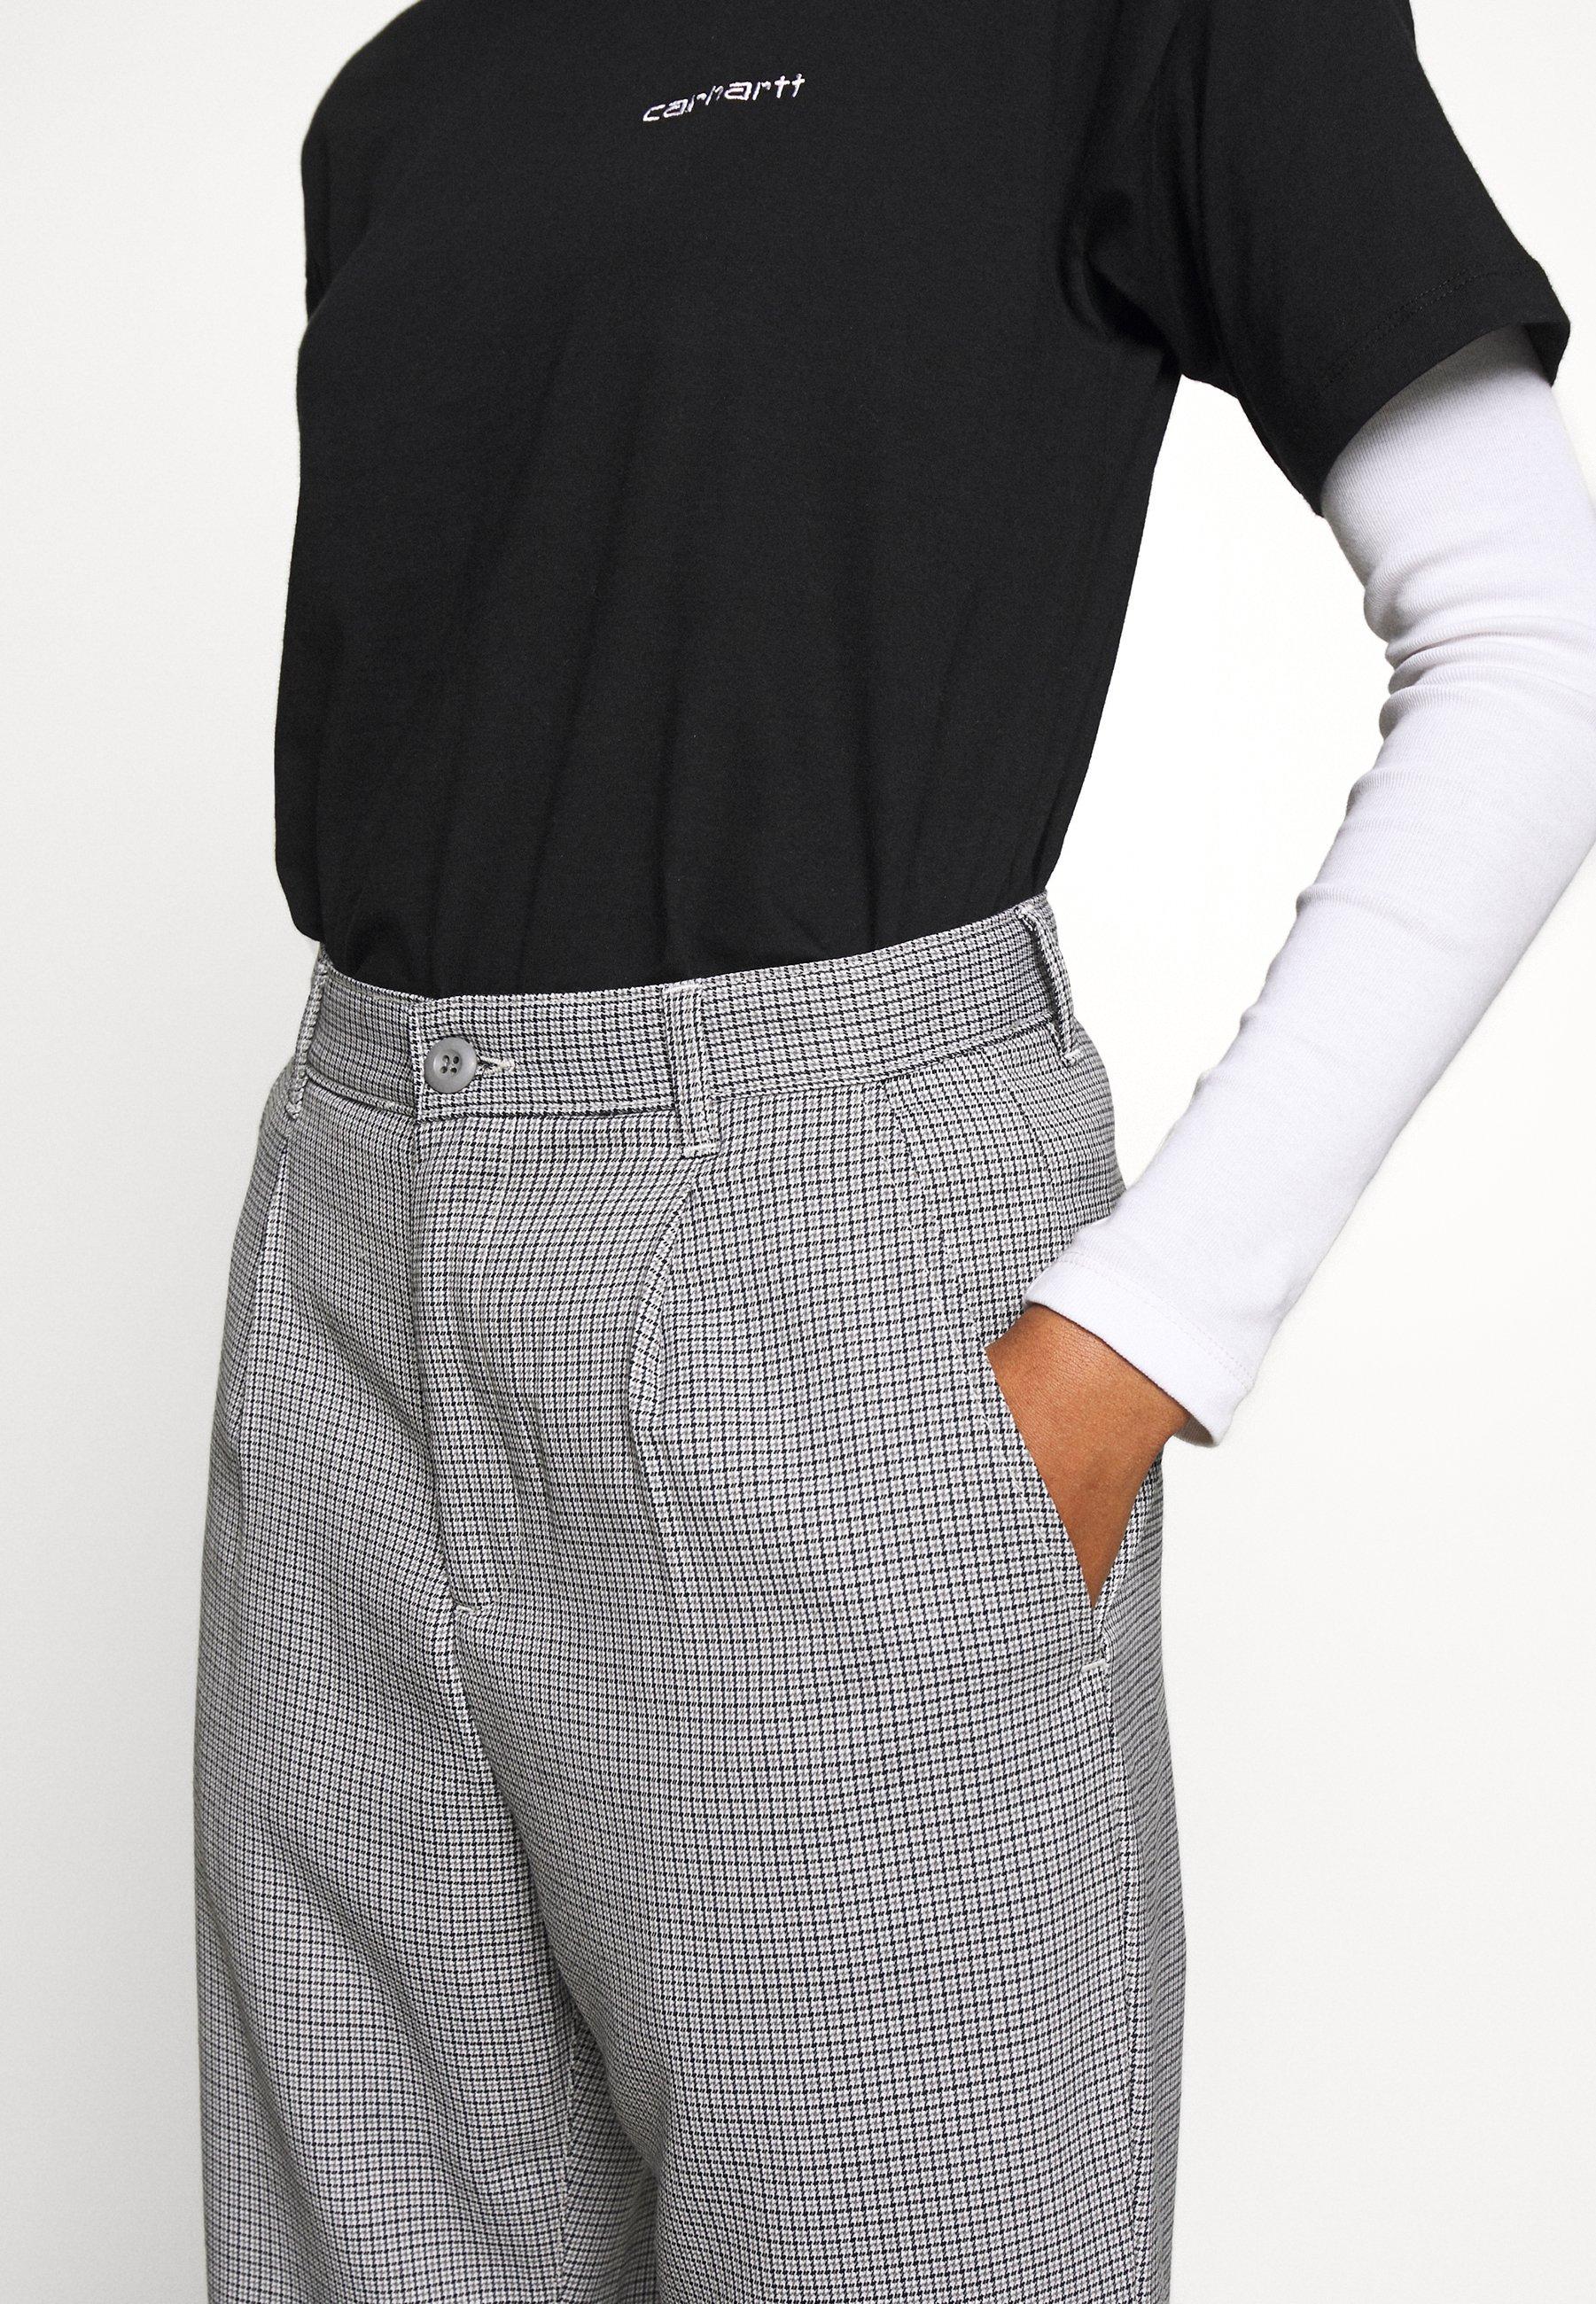 Carhartt WIP PULLMAN PANT MONTEBELLO - Trousers - black rigid